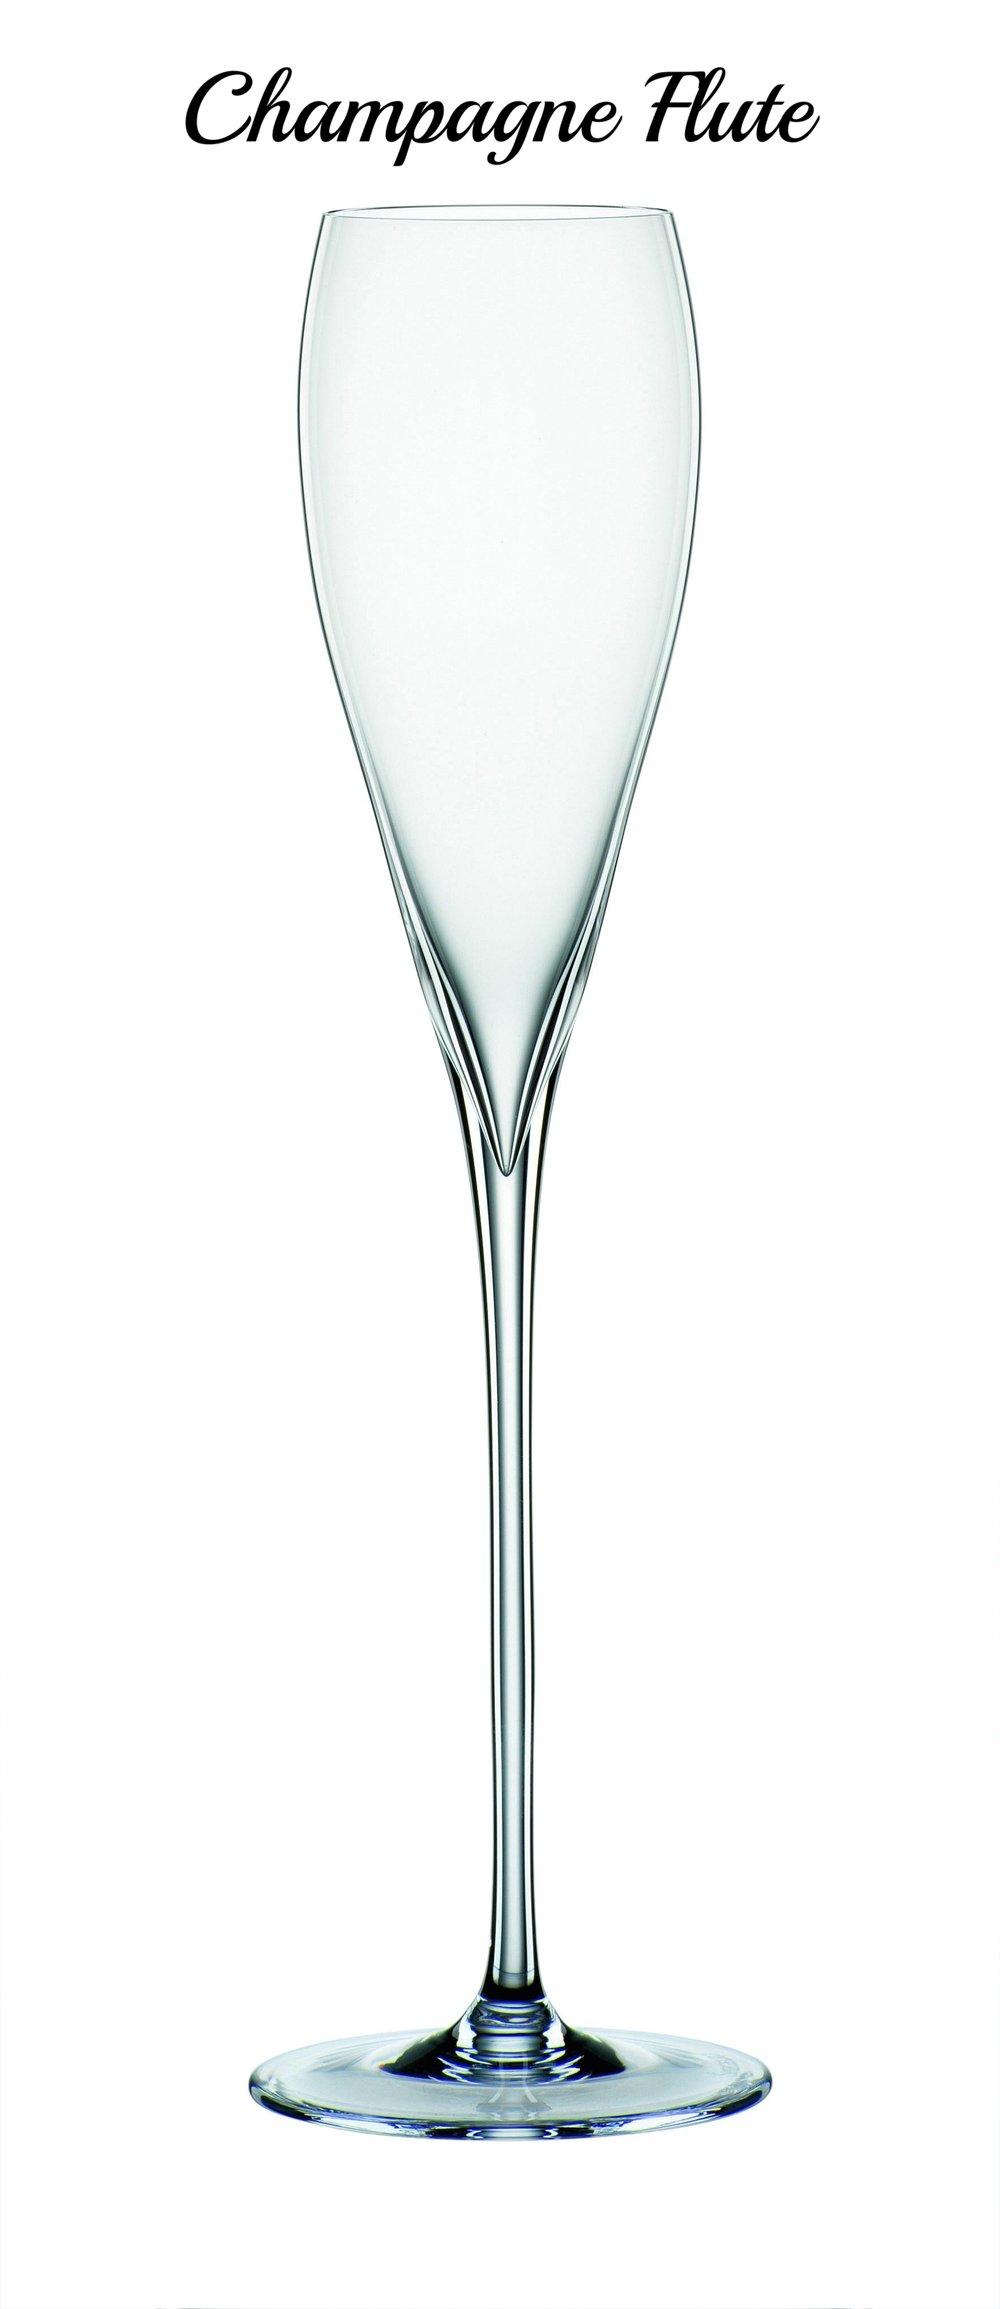 Adina Prestige Champ Flute 4908007.jpg